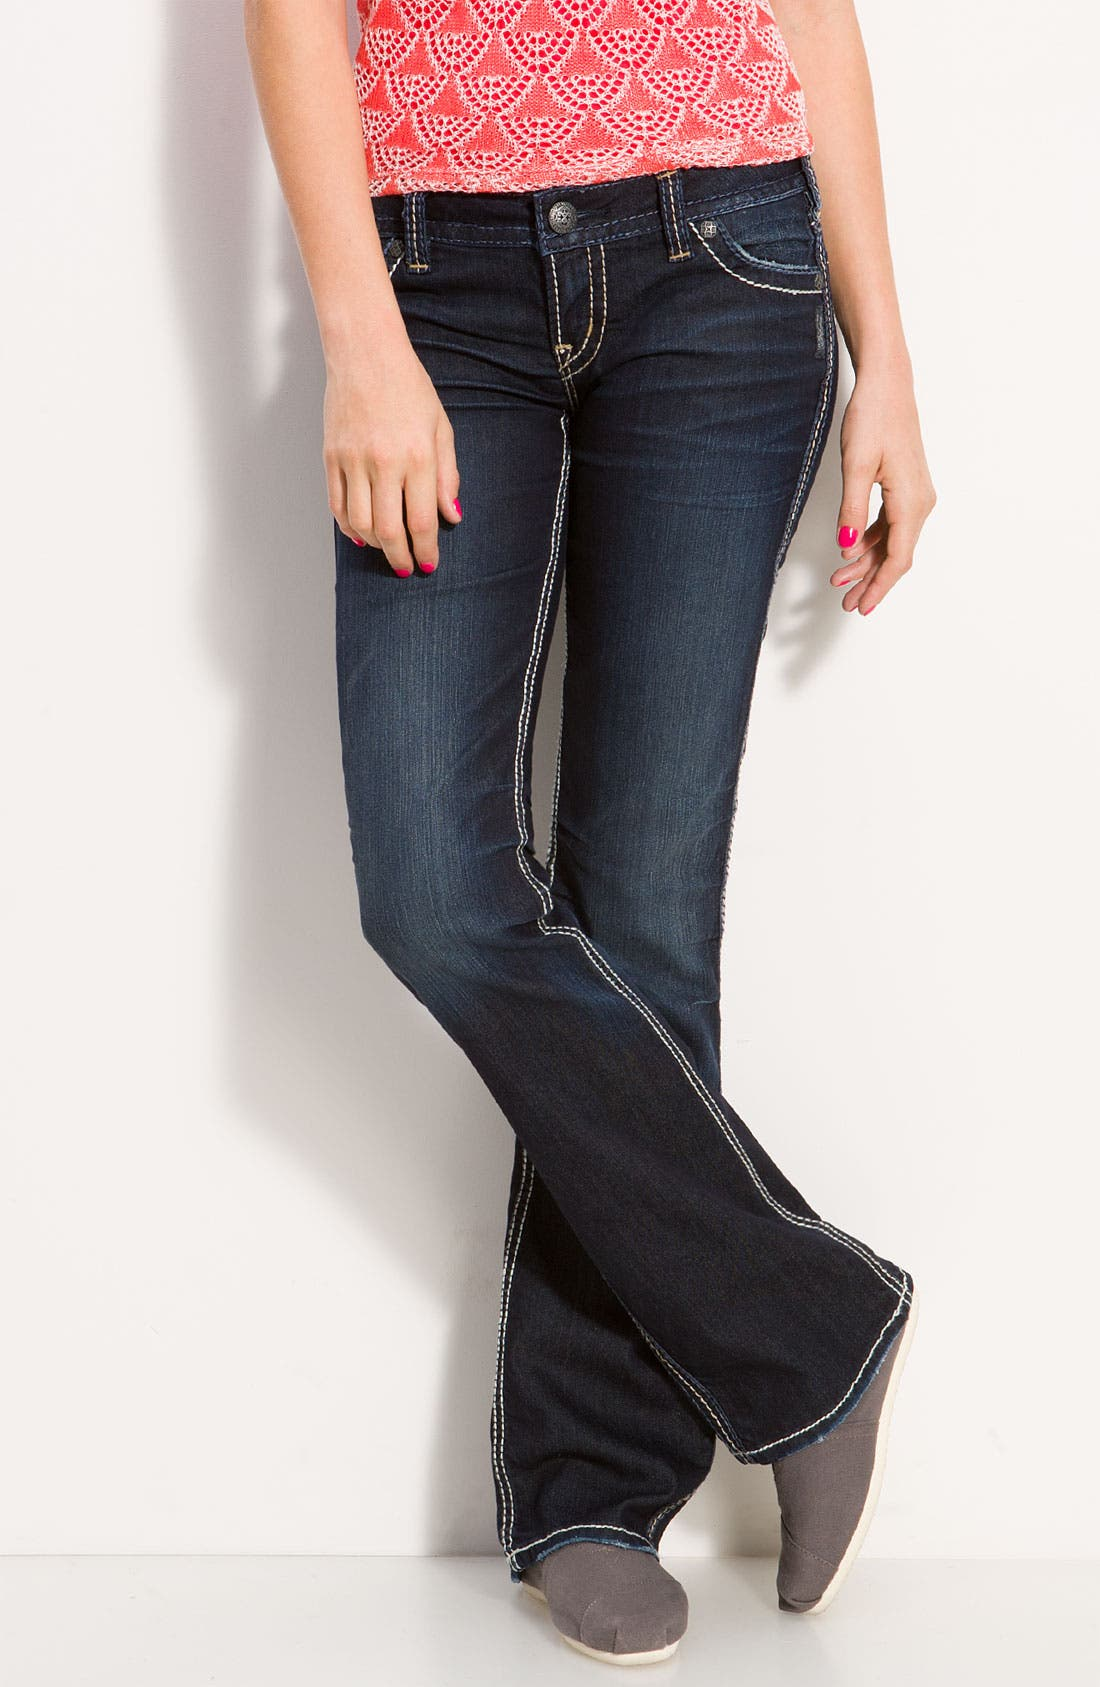 Alternate Image 2  - Silver Jeans Co. 'Frances' Bootcut Jeans (Indigo Wash) (Juniors Regular & Long)